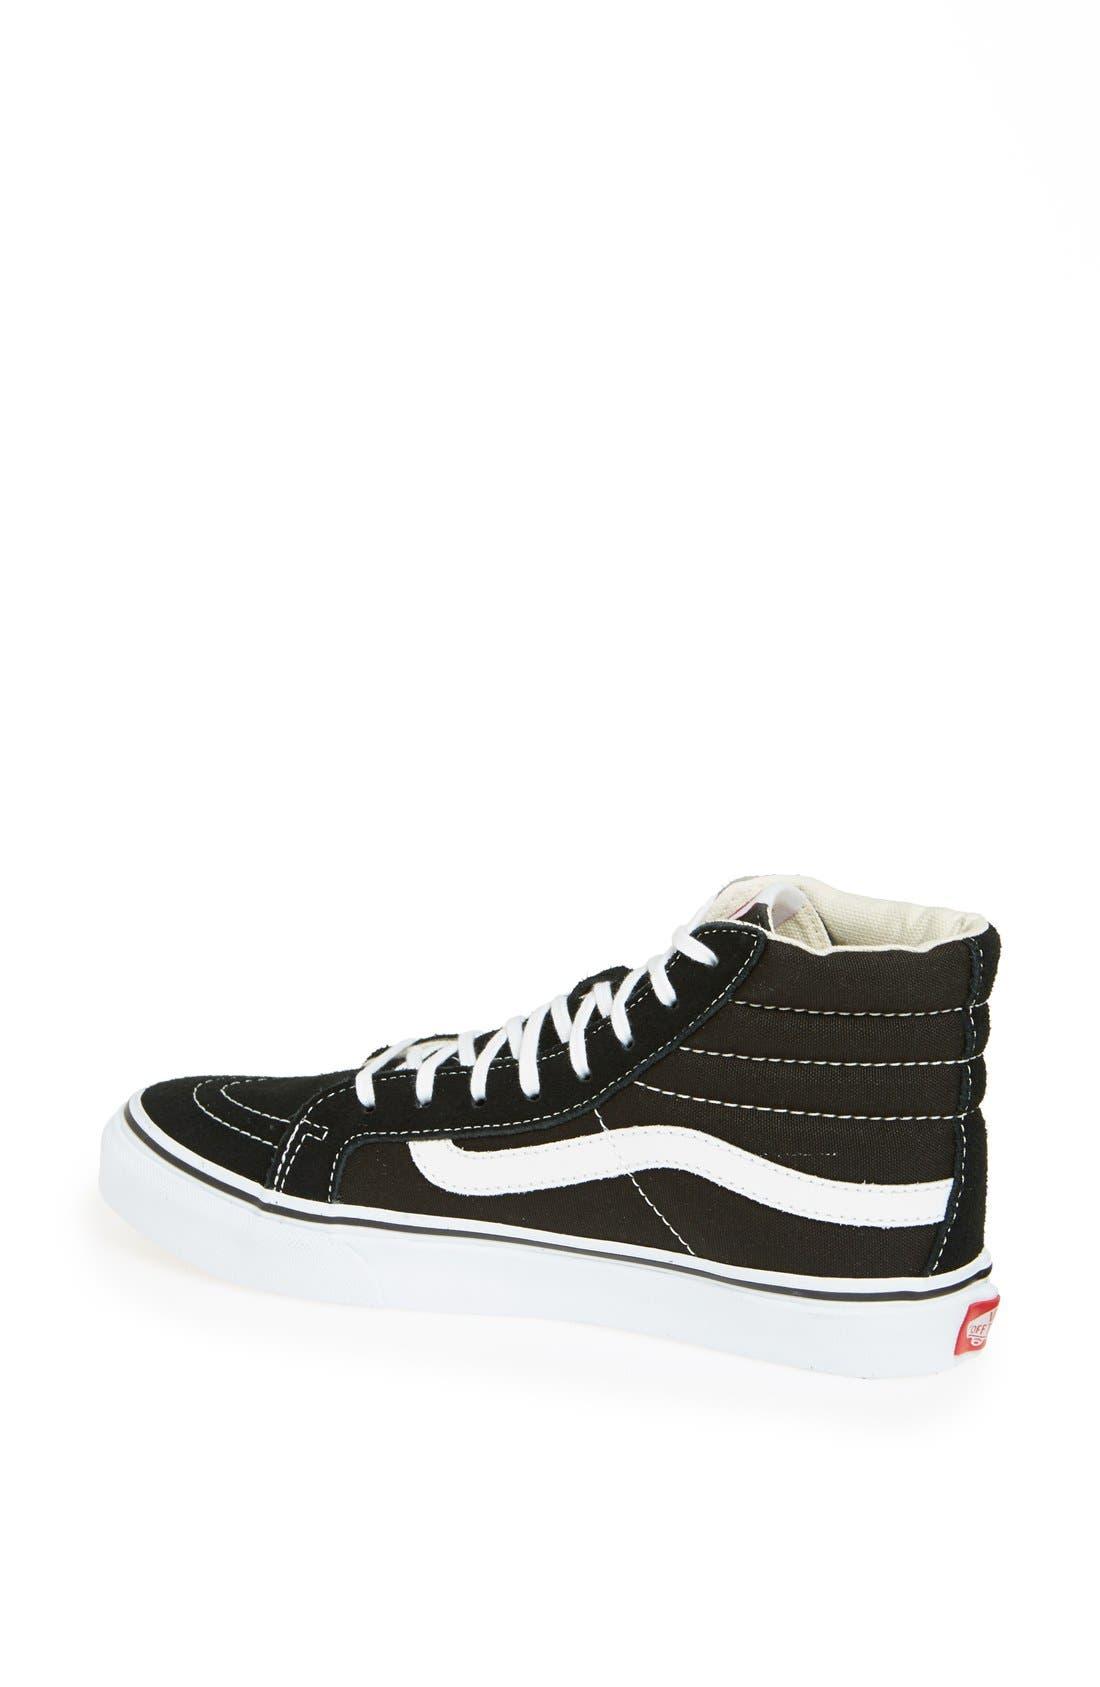 VANS, Sk8-Hi Slim High Top Sneaker, Alternate thumbnail 5, color, BLACK TRUE WHITE